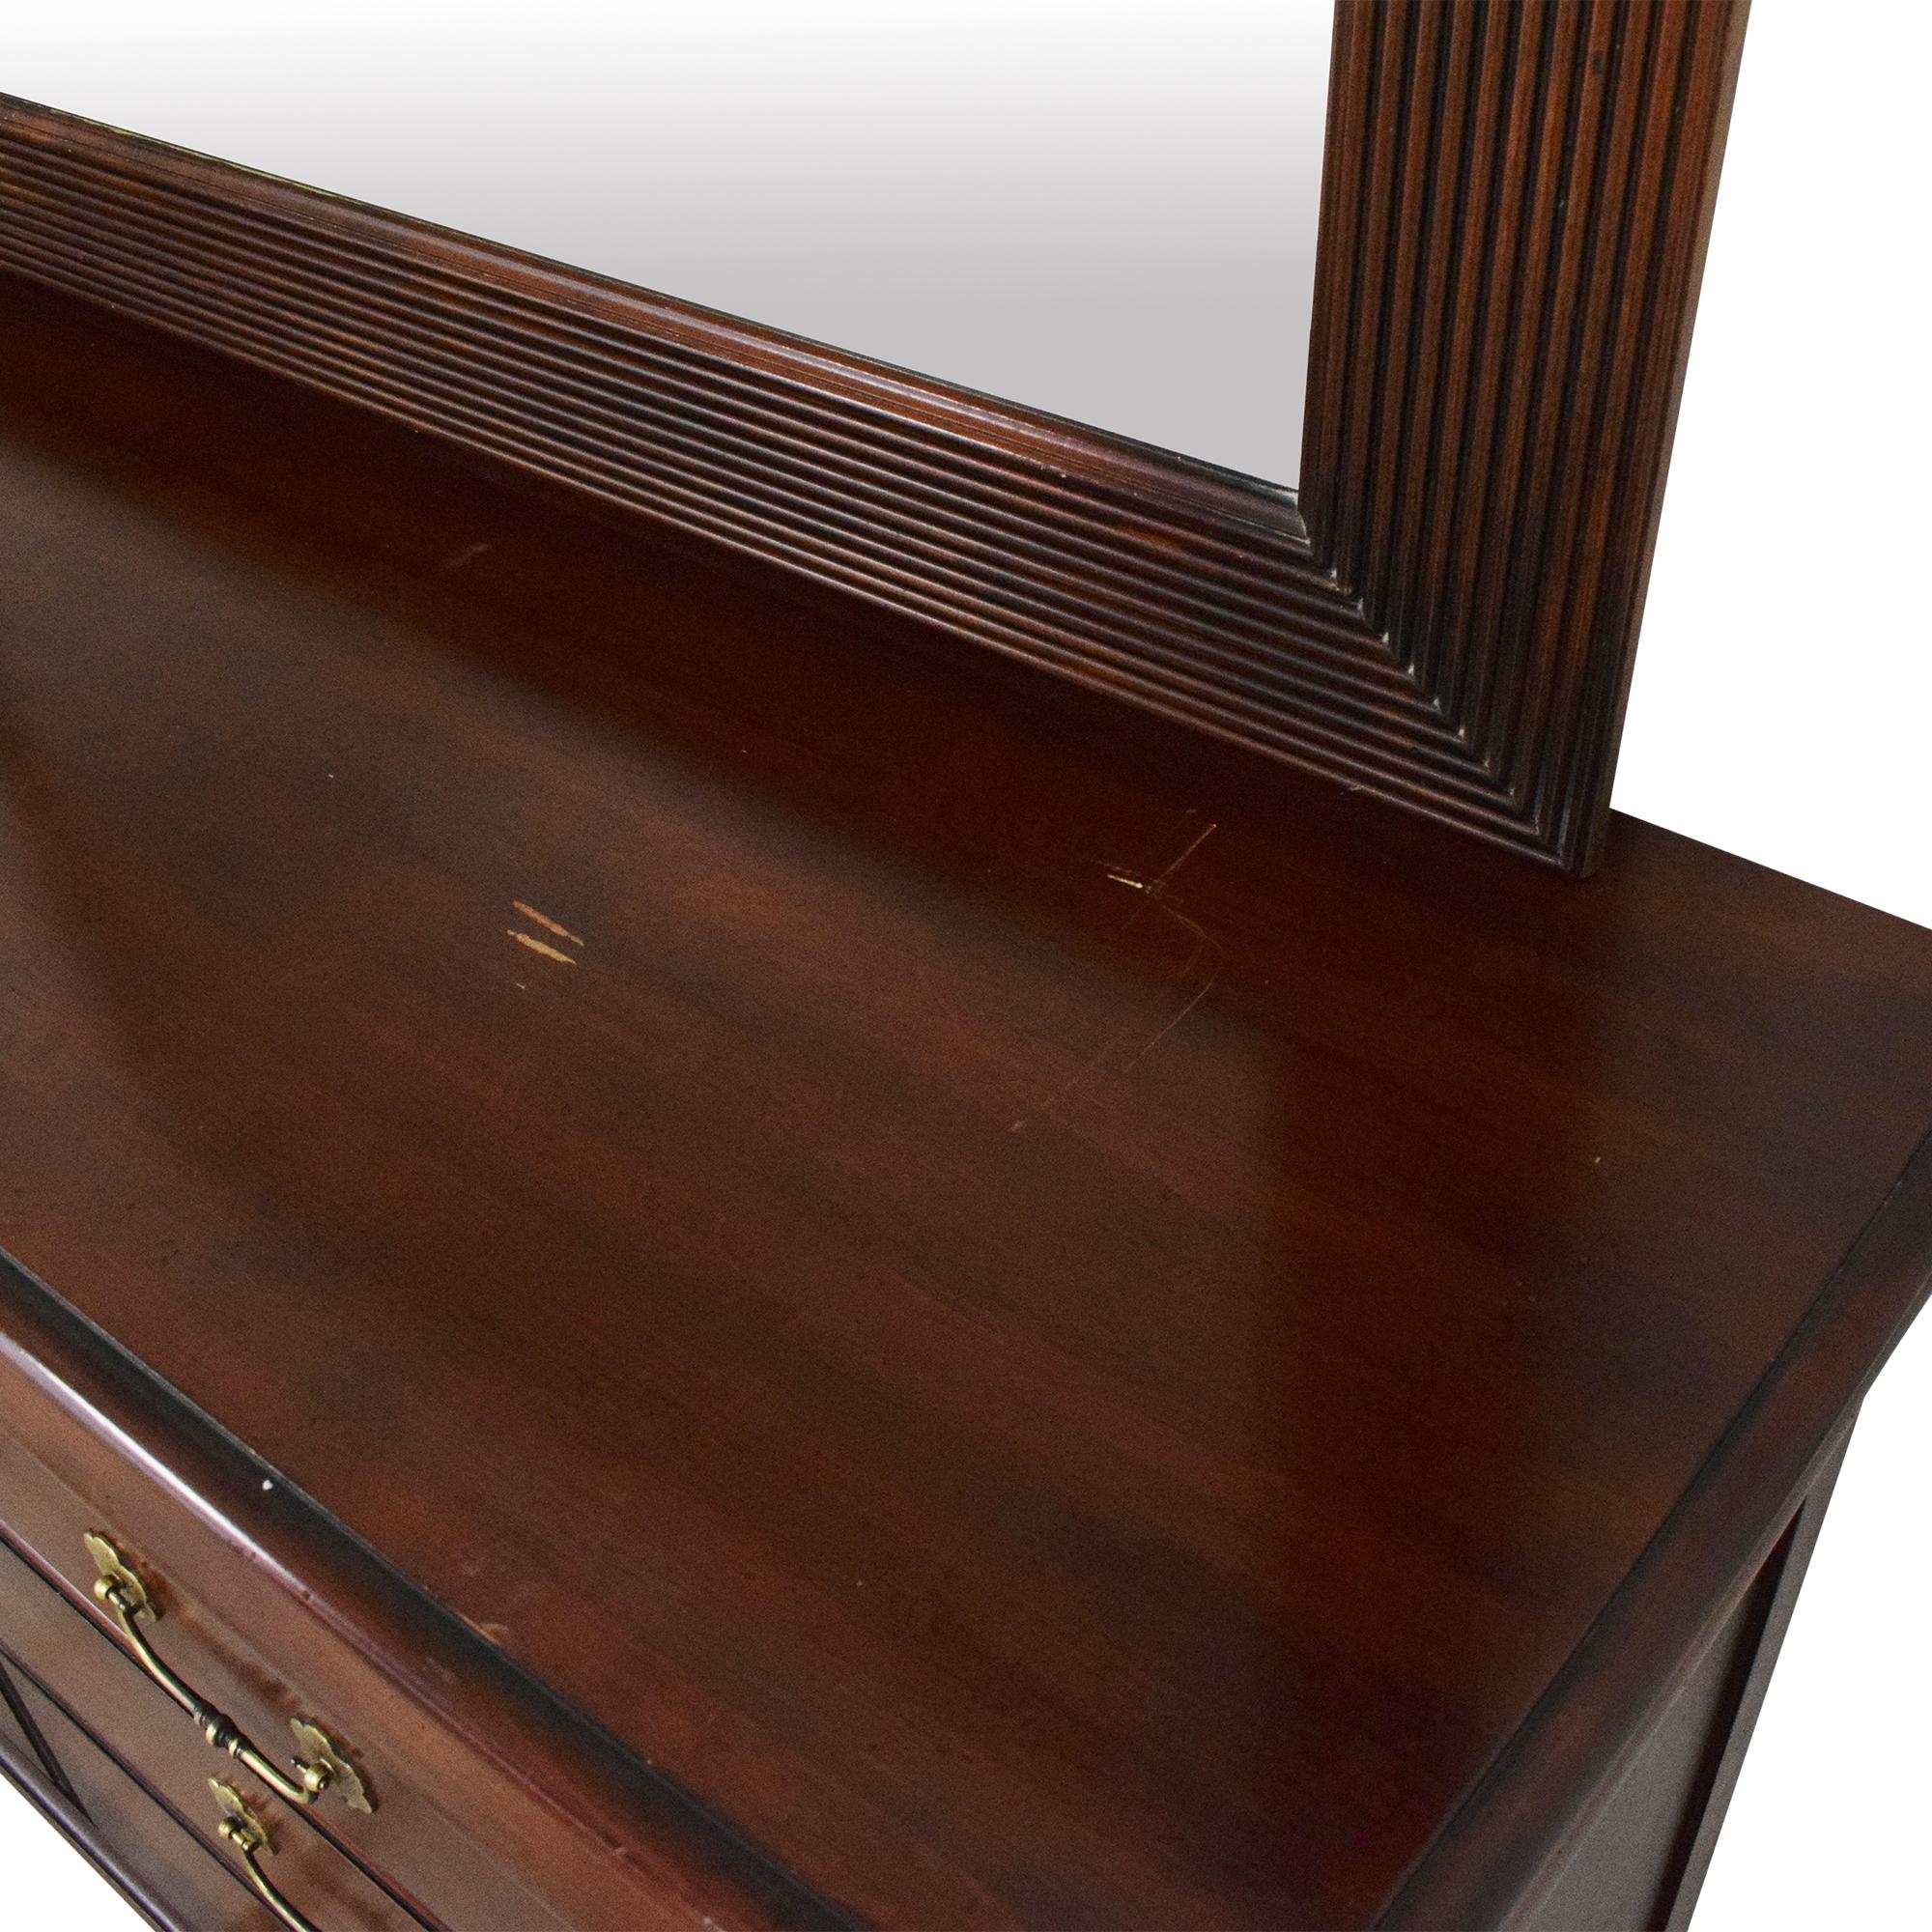 Ethan Allen Ethan Allen British Classics Marques Dresser with Mirror Dressers